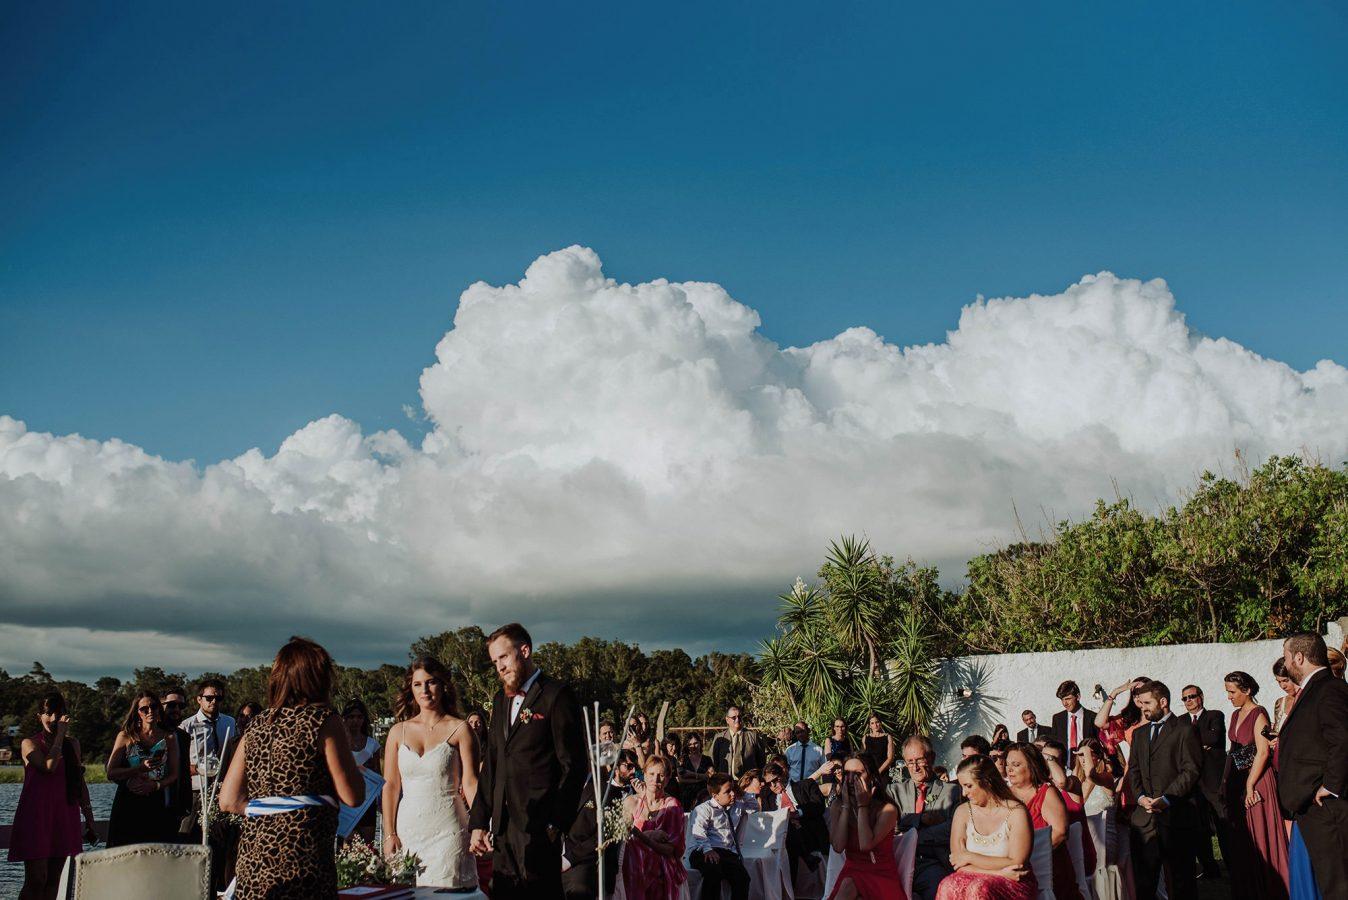 fotografos-de-boda-uruguay-11